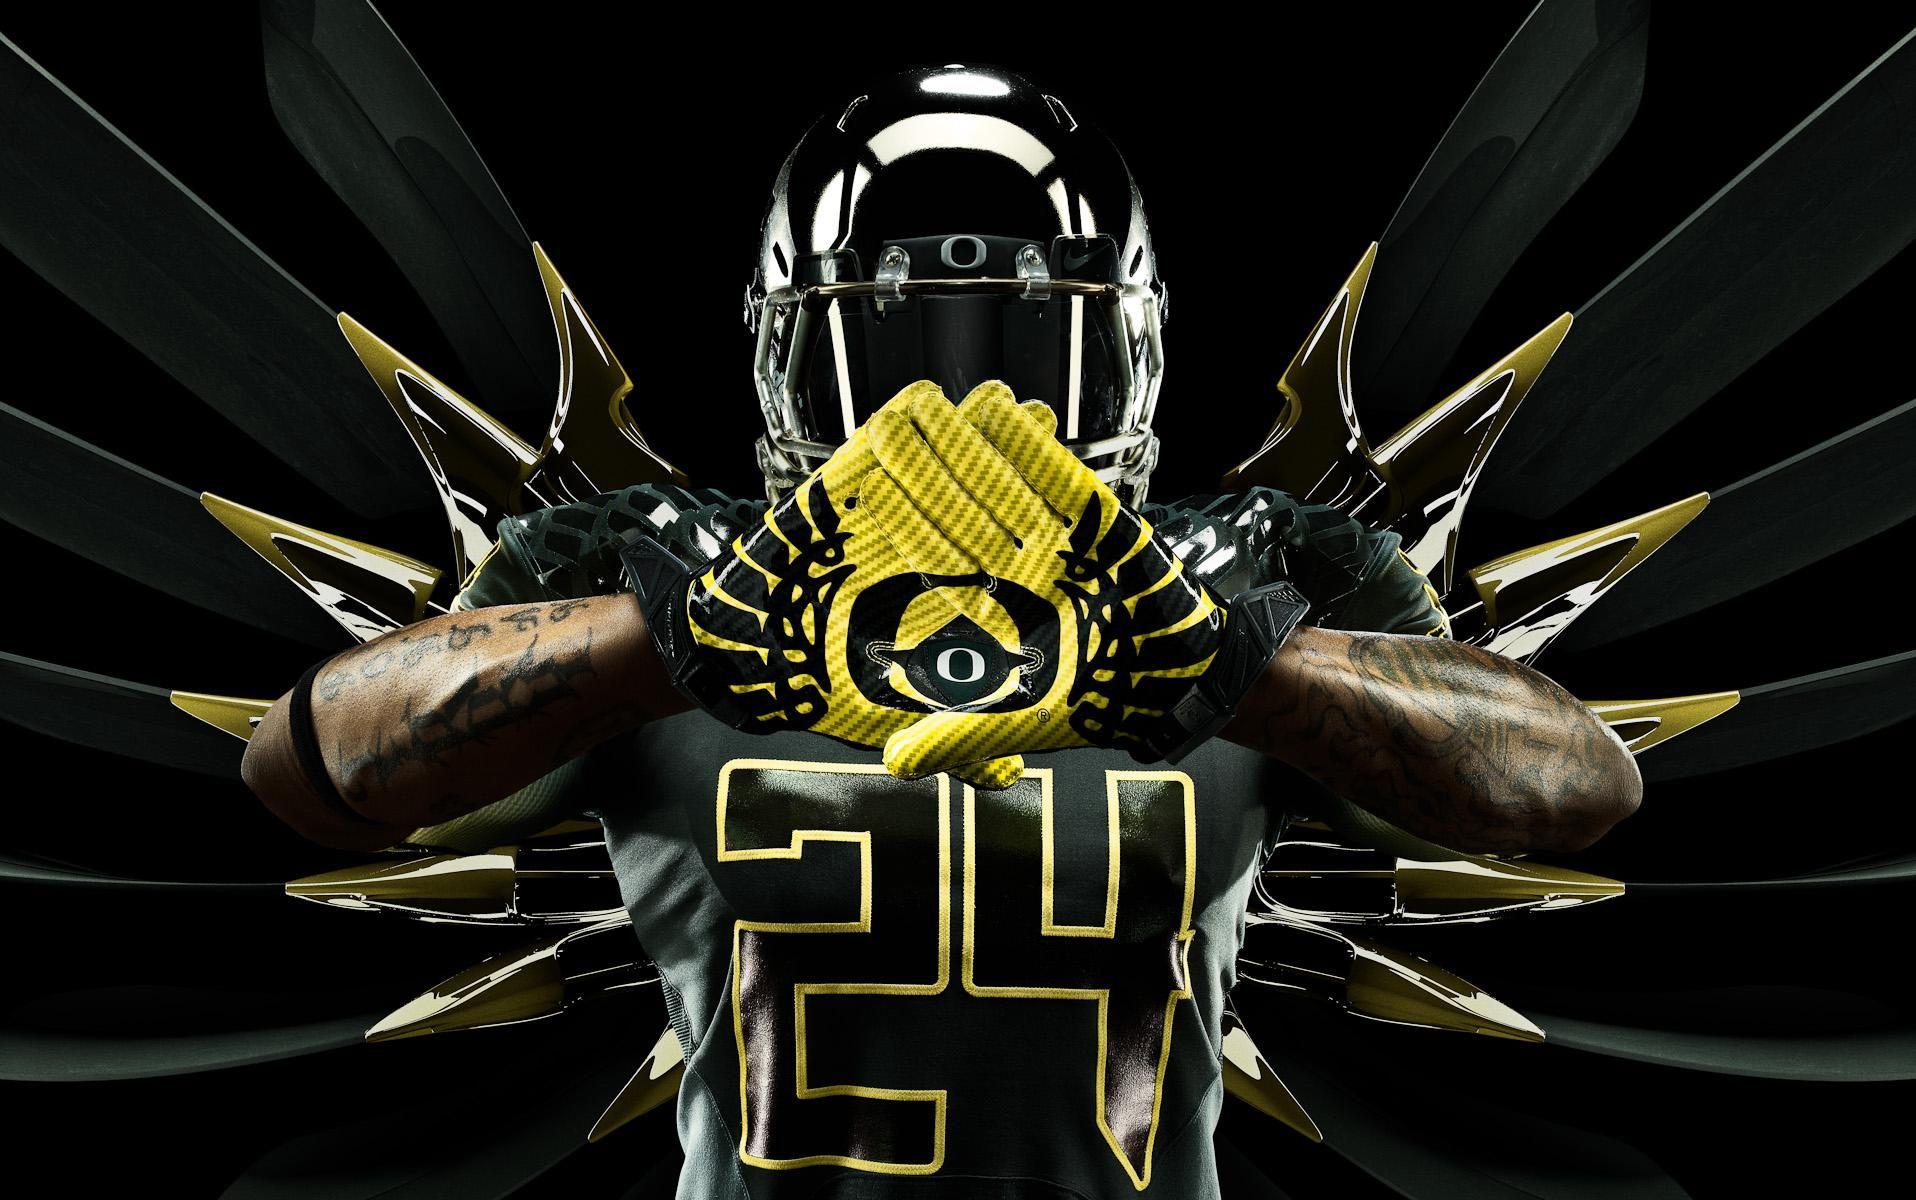 Oregon Ducks Wallpapers Screensavers Oregon Ducks Uniforms Oregon Football Oregon Ducks